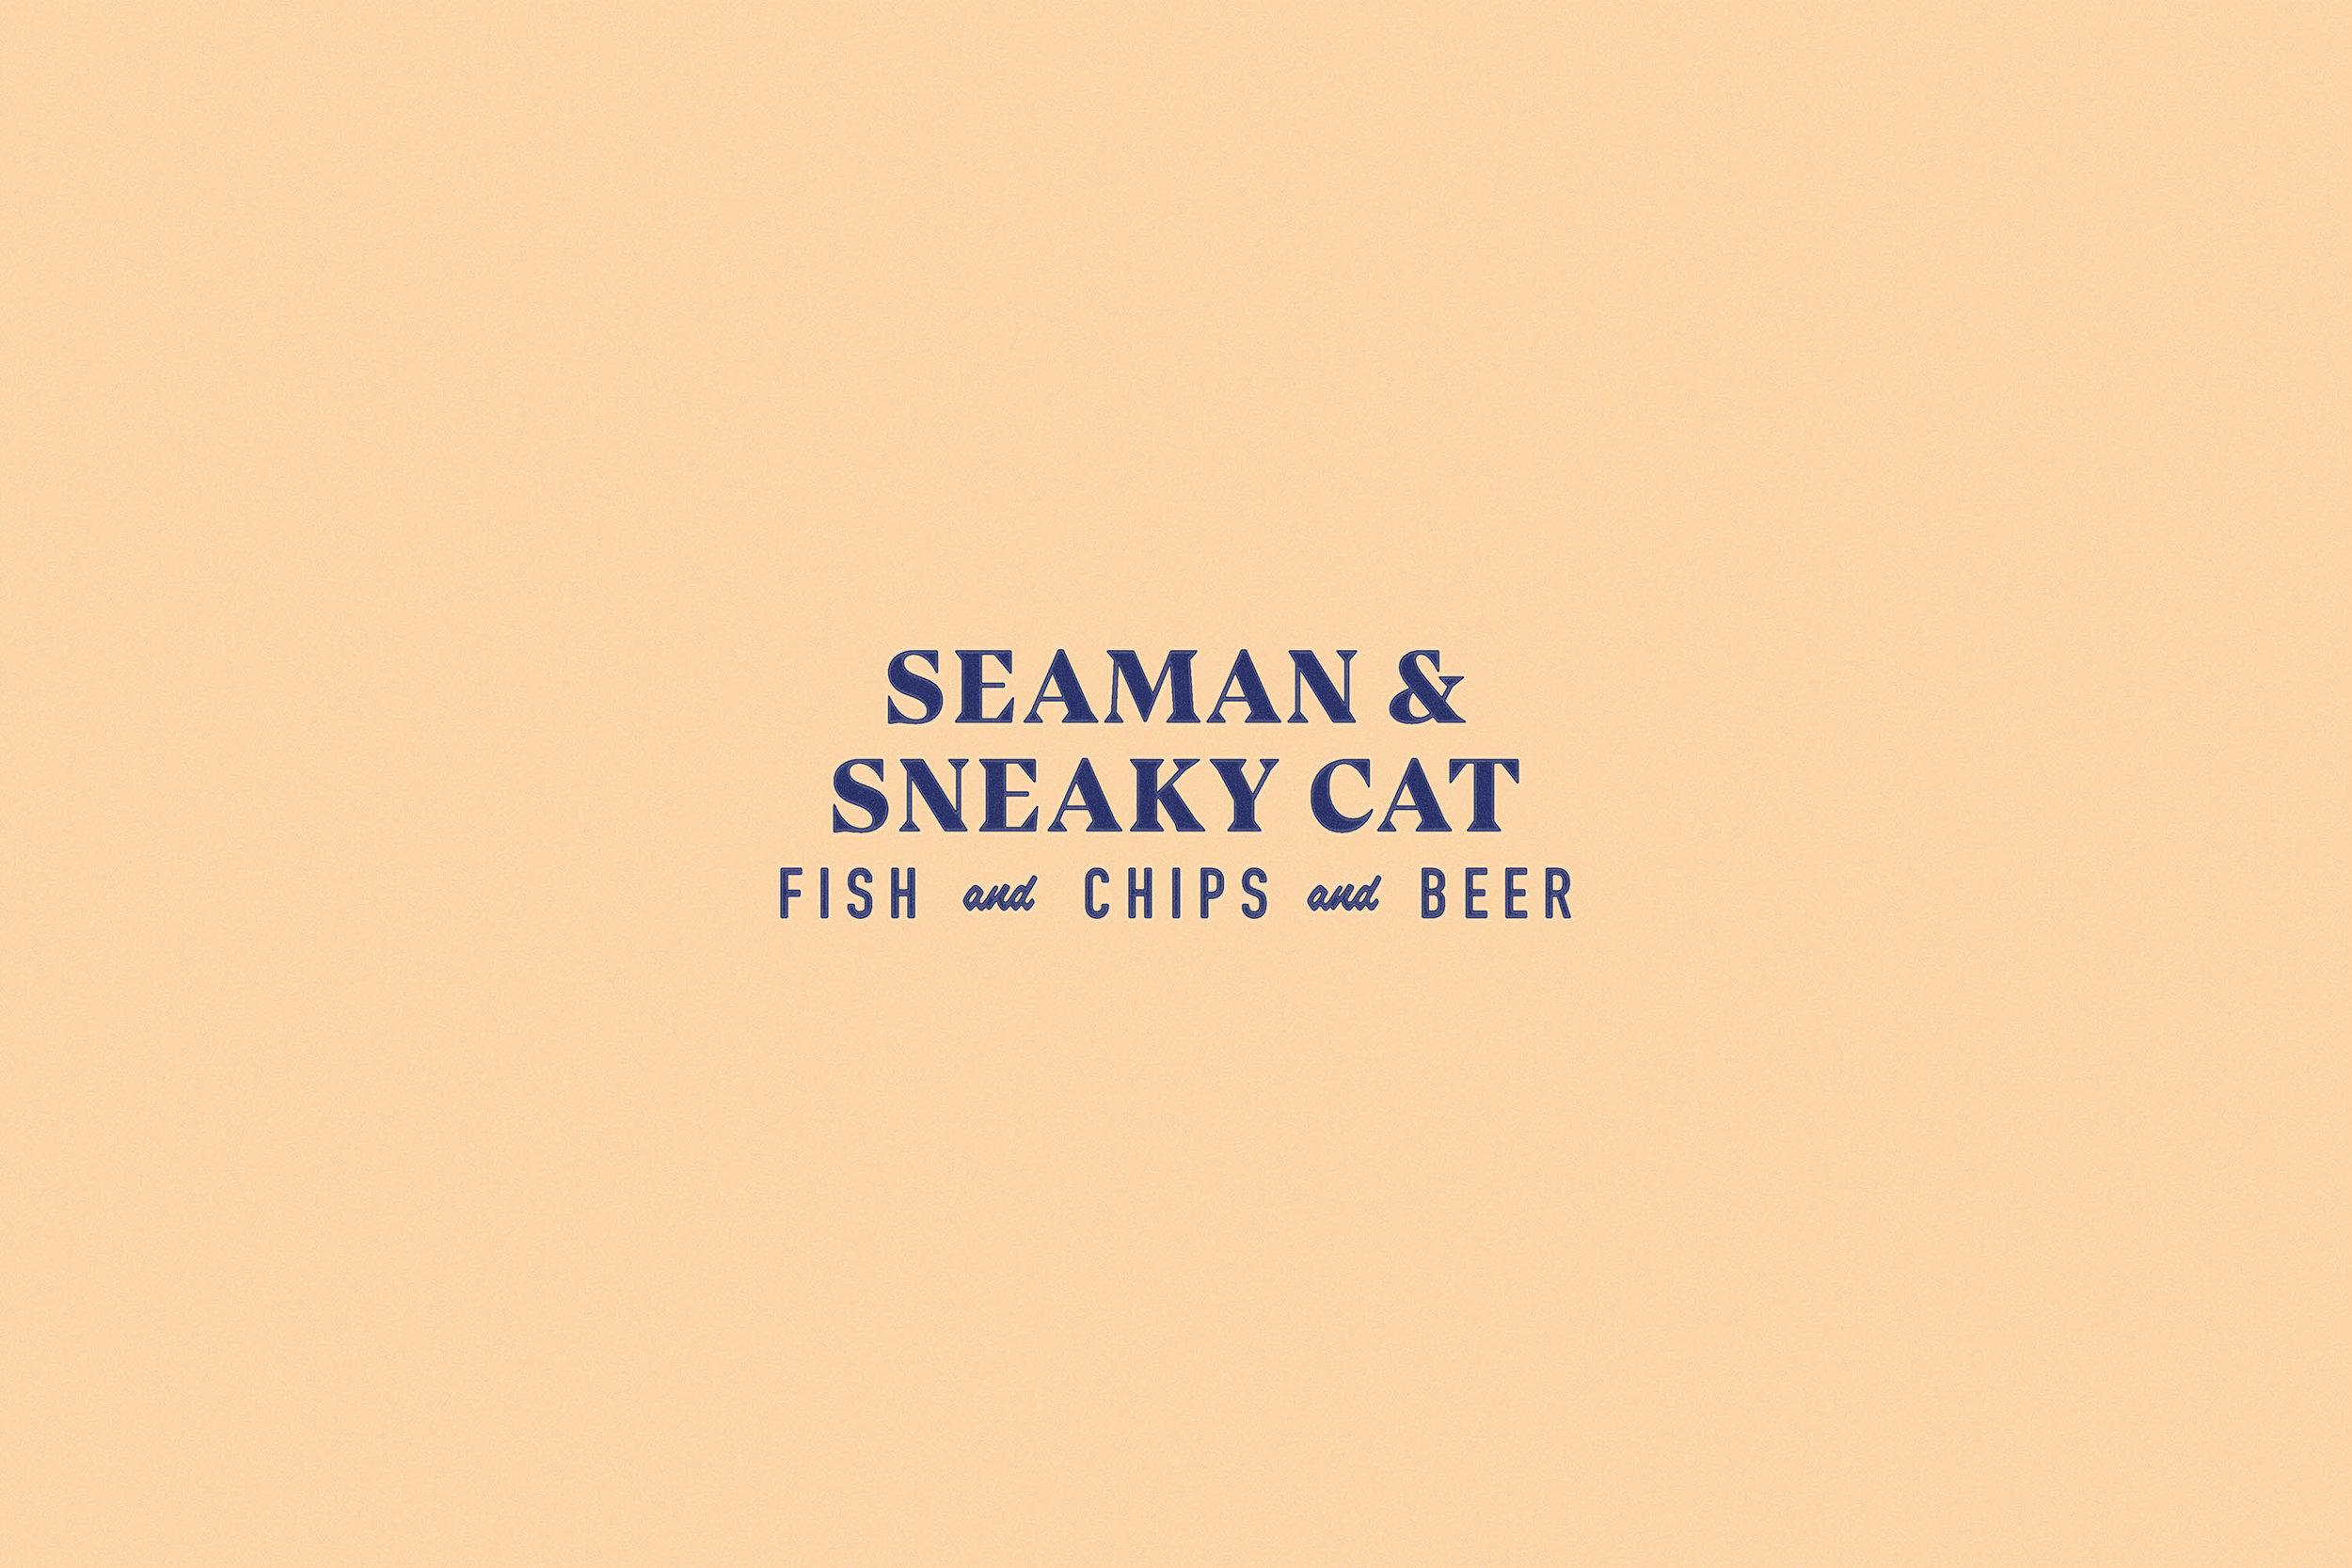 seaman_and_sneaky_cat_2.jpg